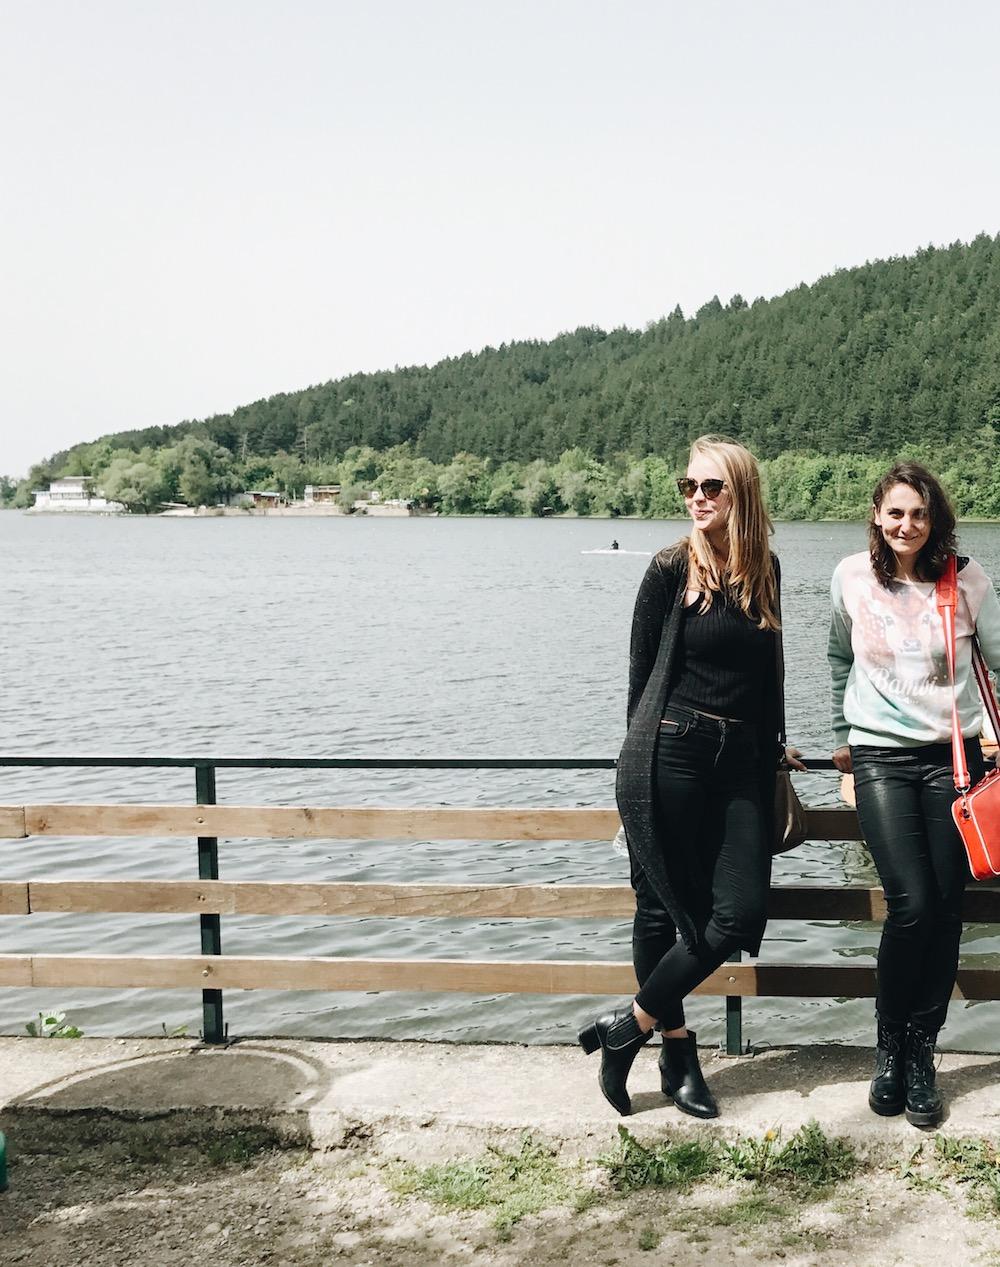 Lake Pancharevo, Sofia, Bulgaria | Travel Guide by Ruby Josephine